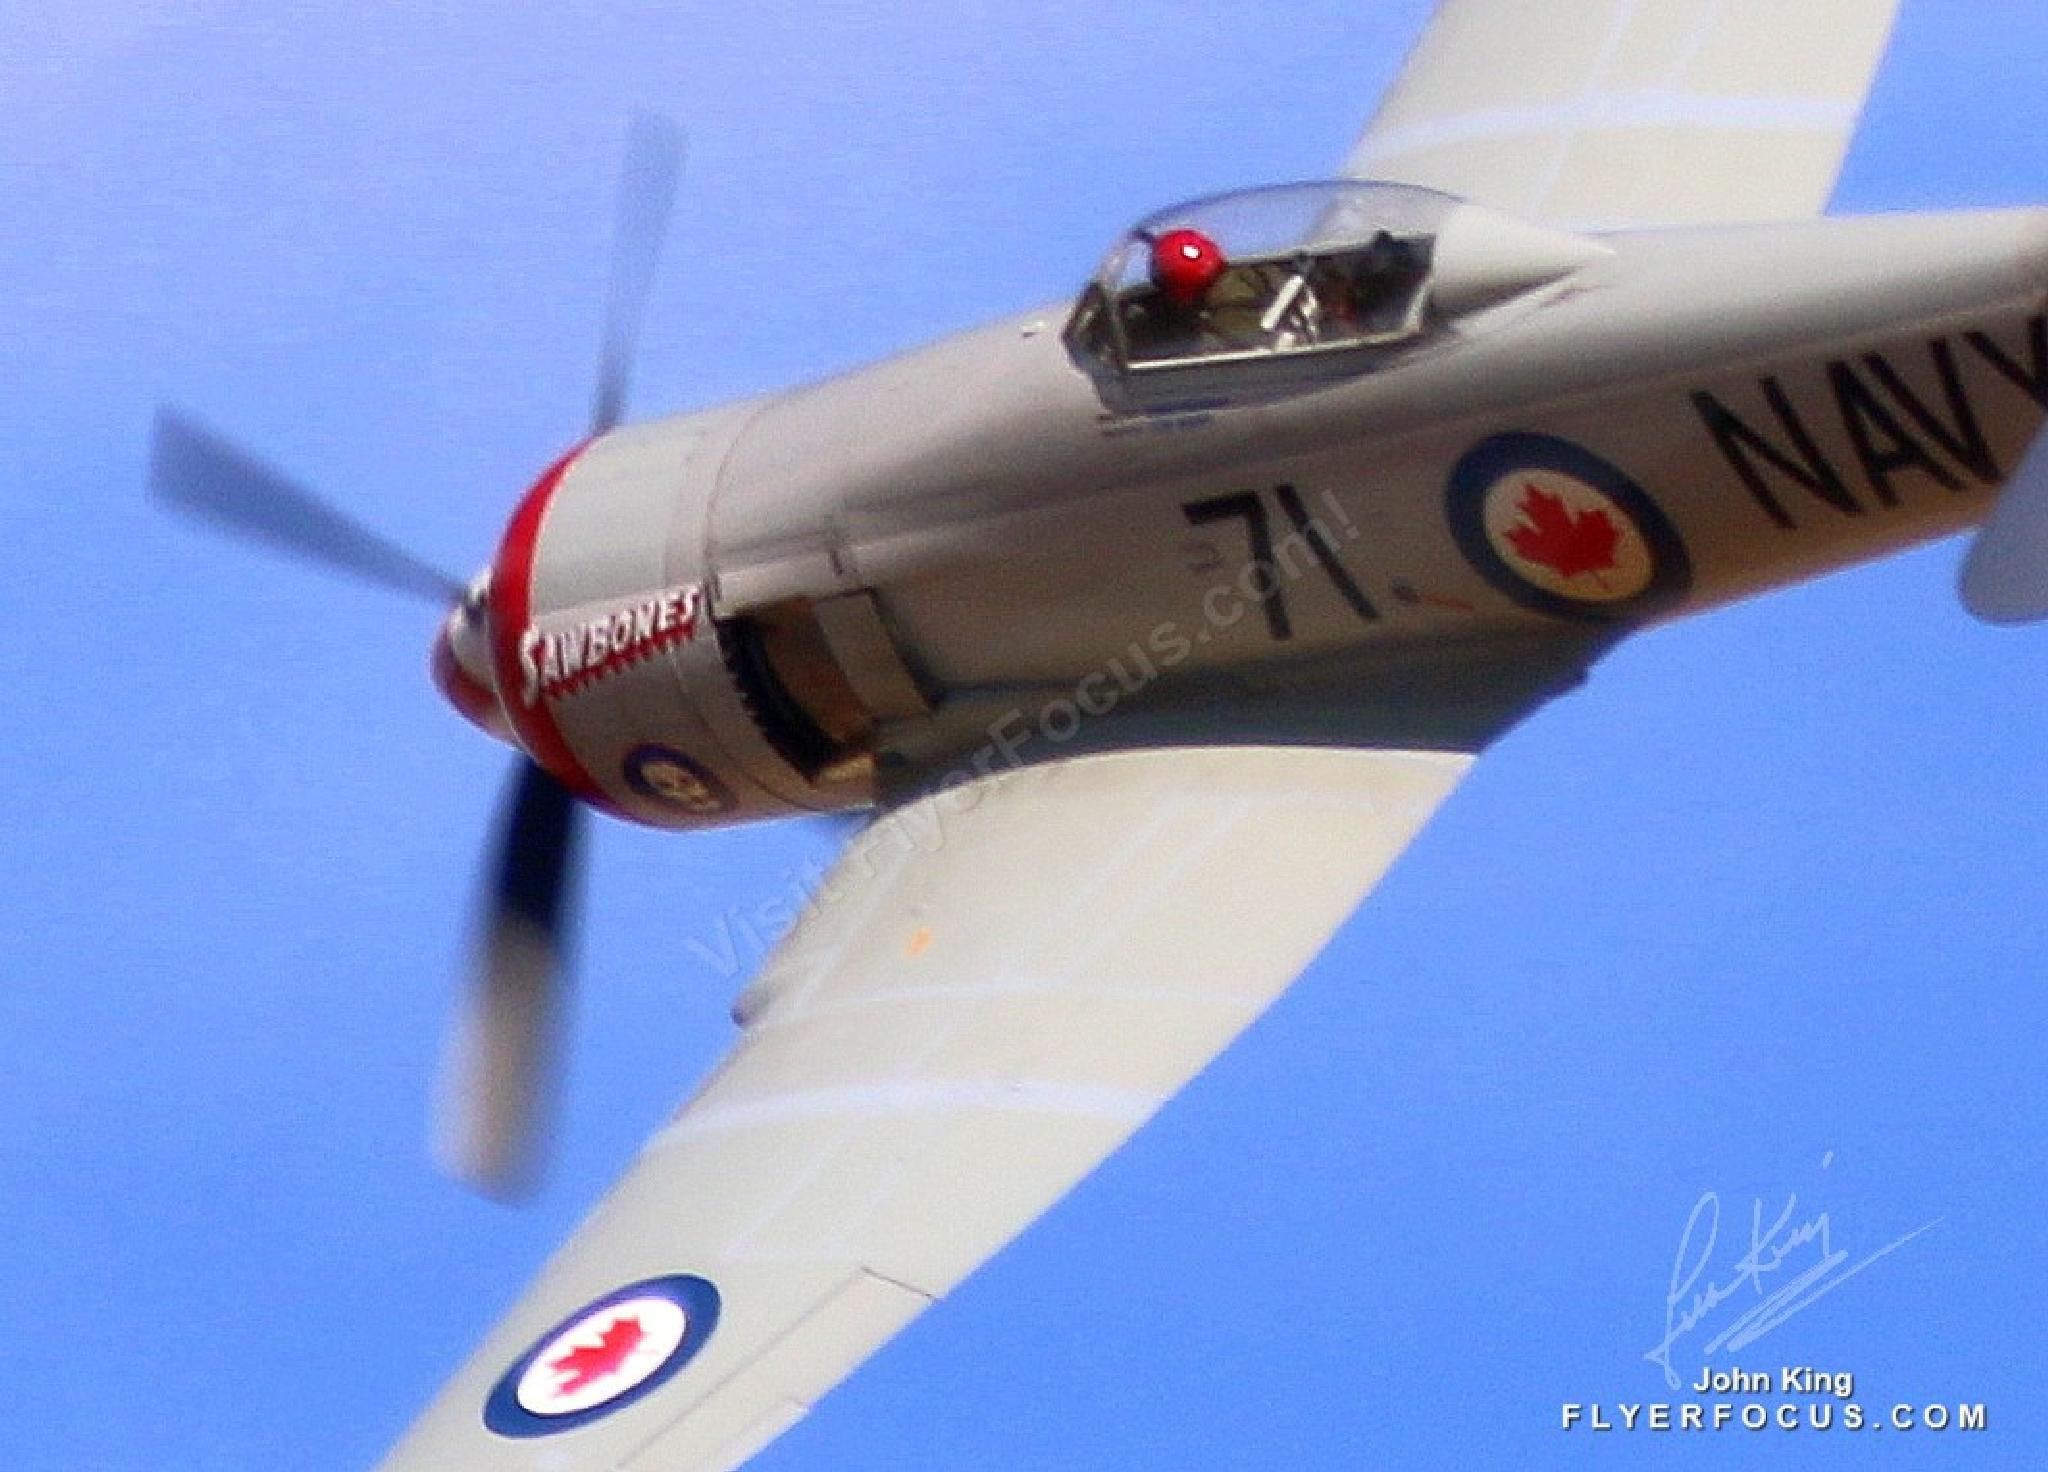 Sawbones, Hawker Sea Fury, Rounds East Pylon at Reno Air Races. N71GB by John King